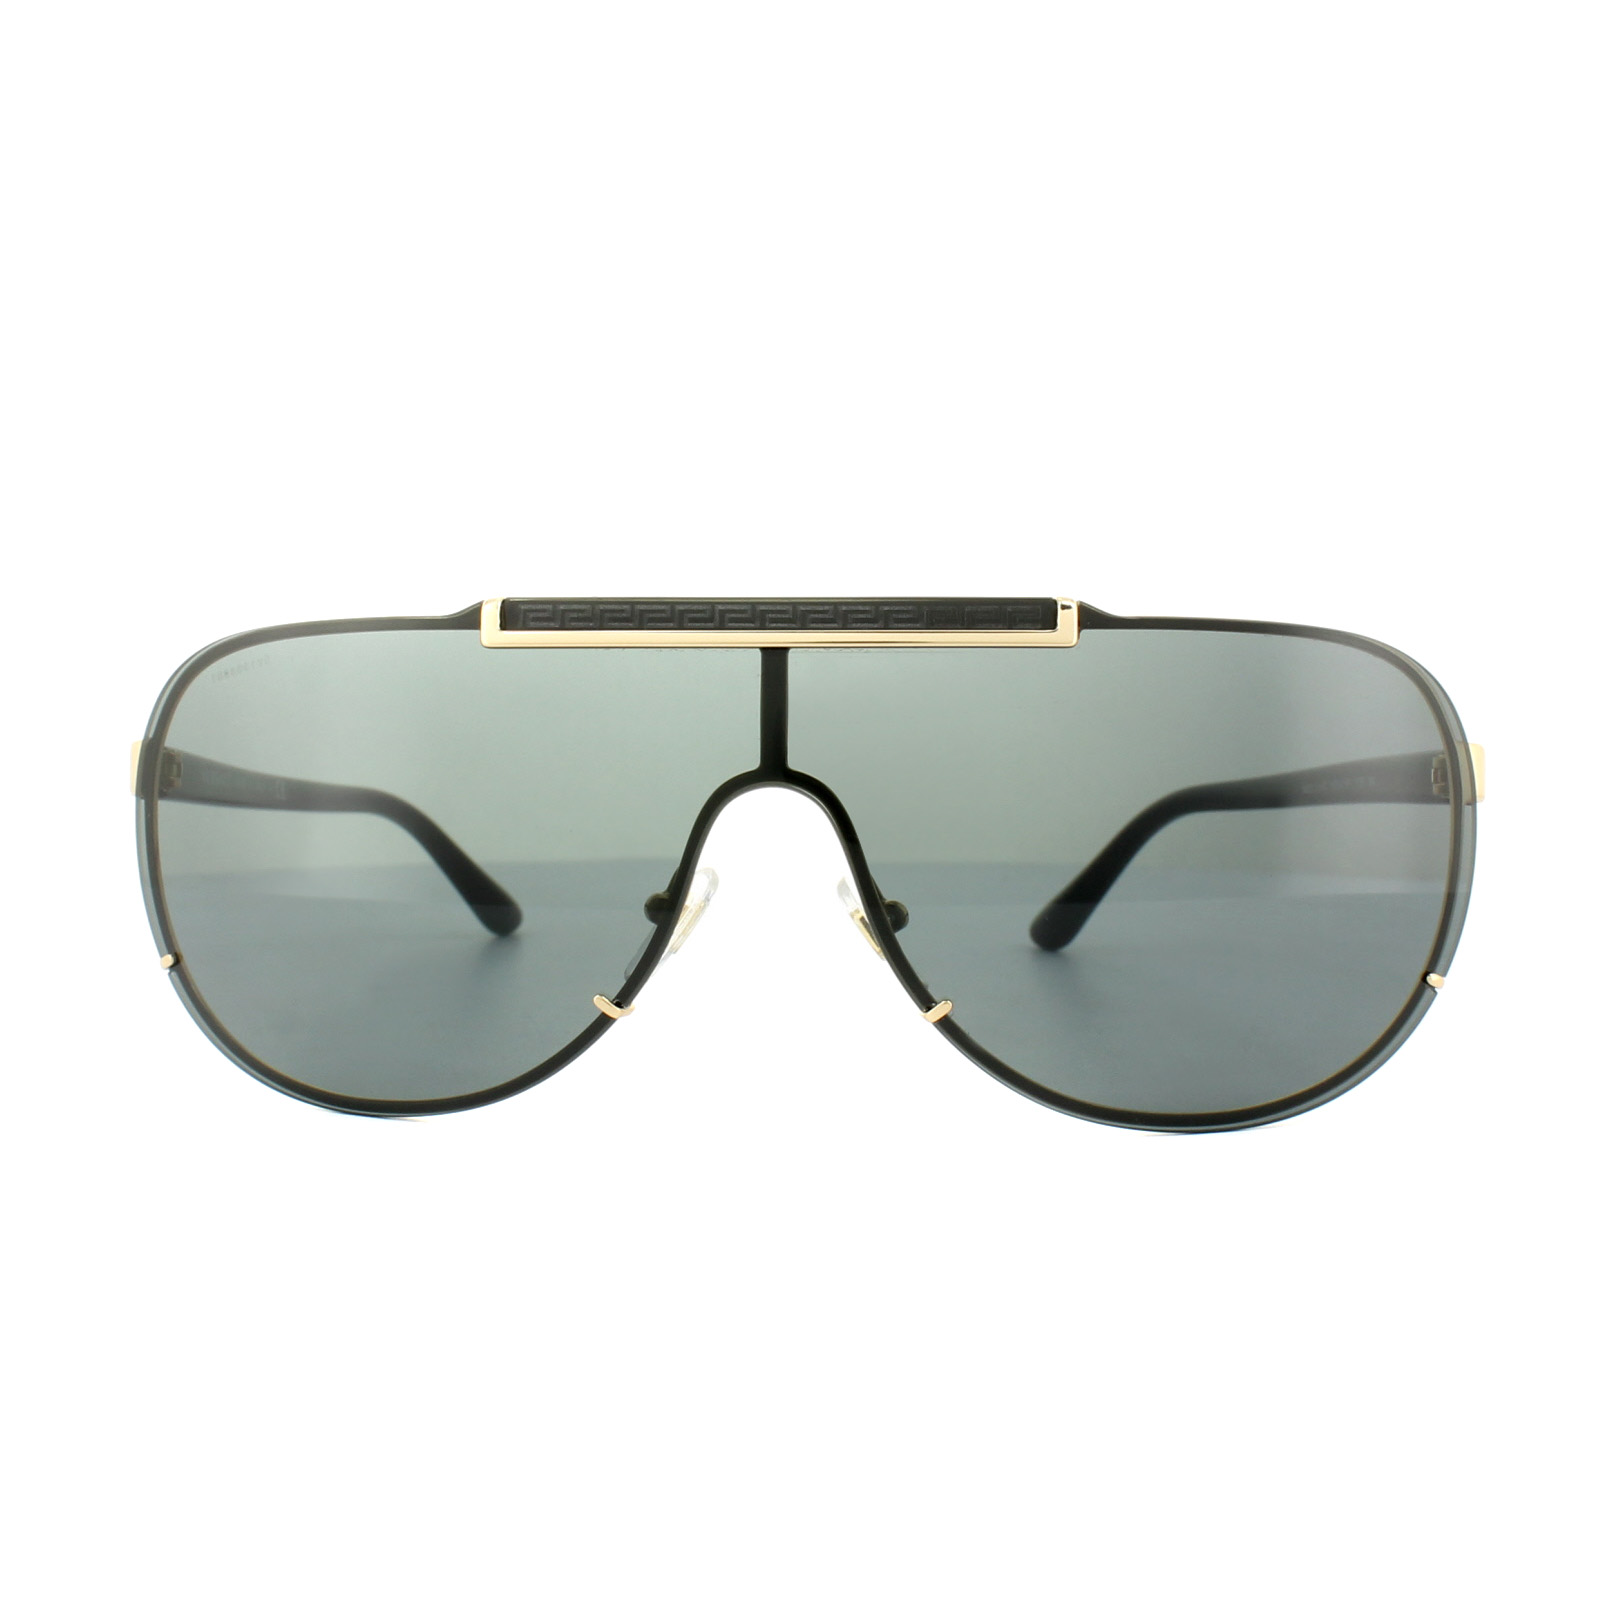 007635753e9e6 Versace Sunglasses 2140 100287 Gold Grey 725125823265